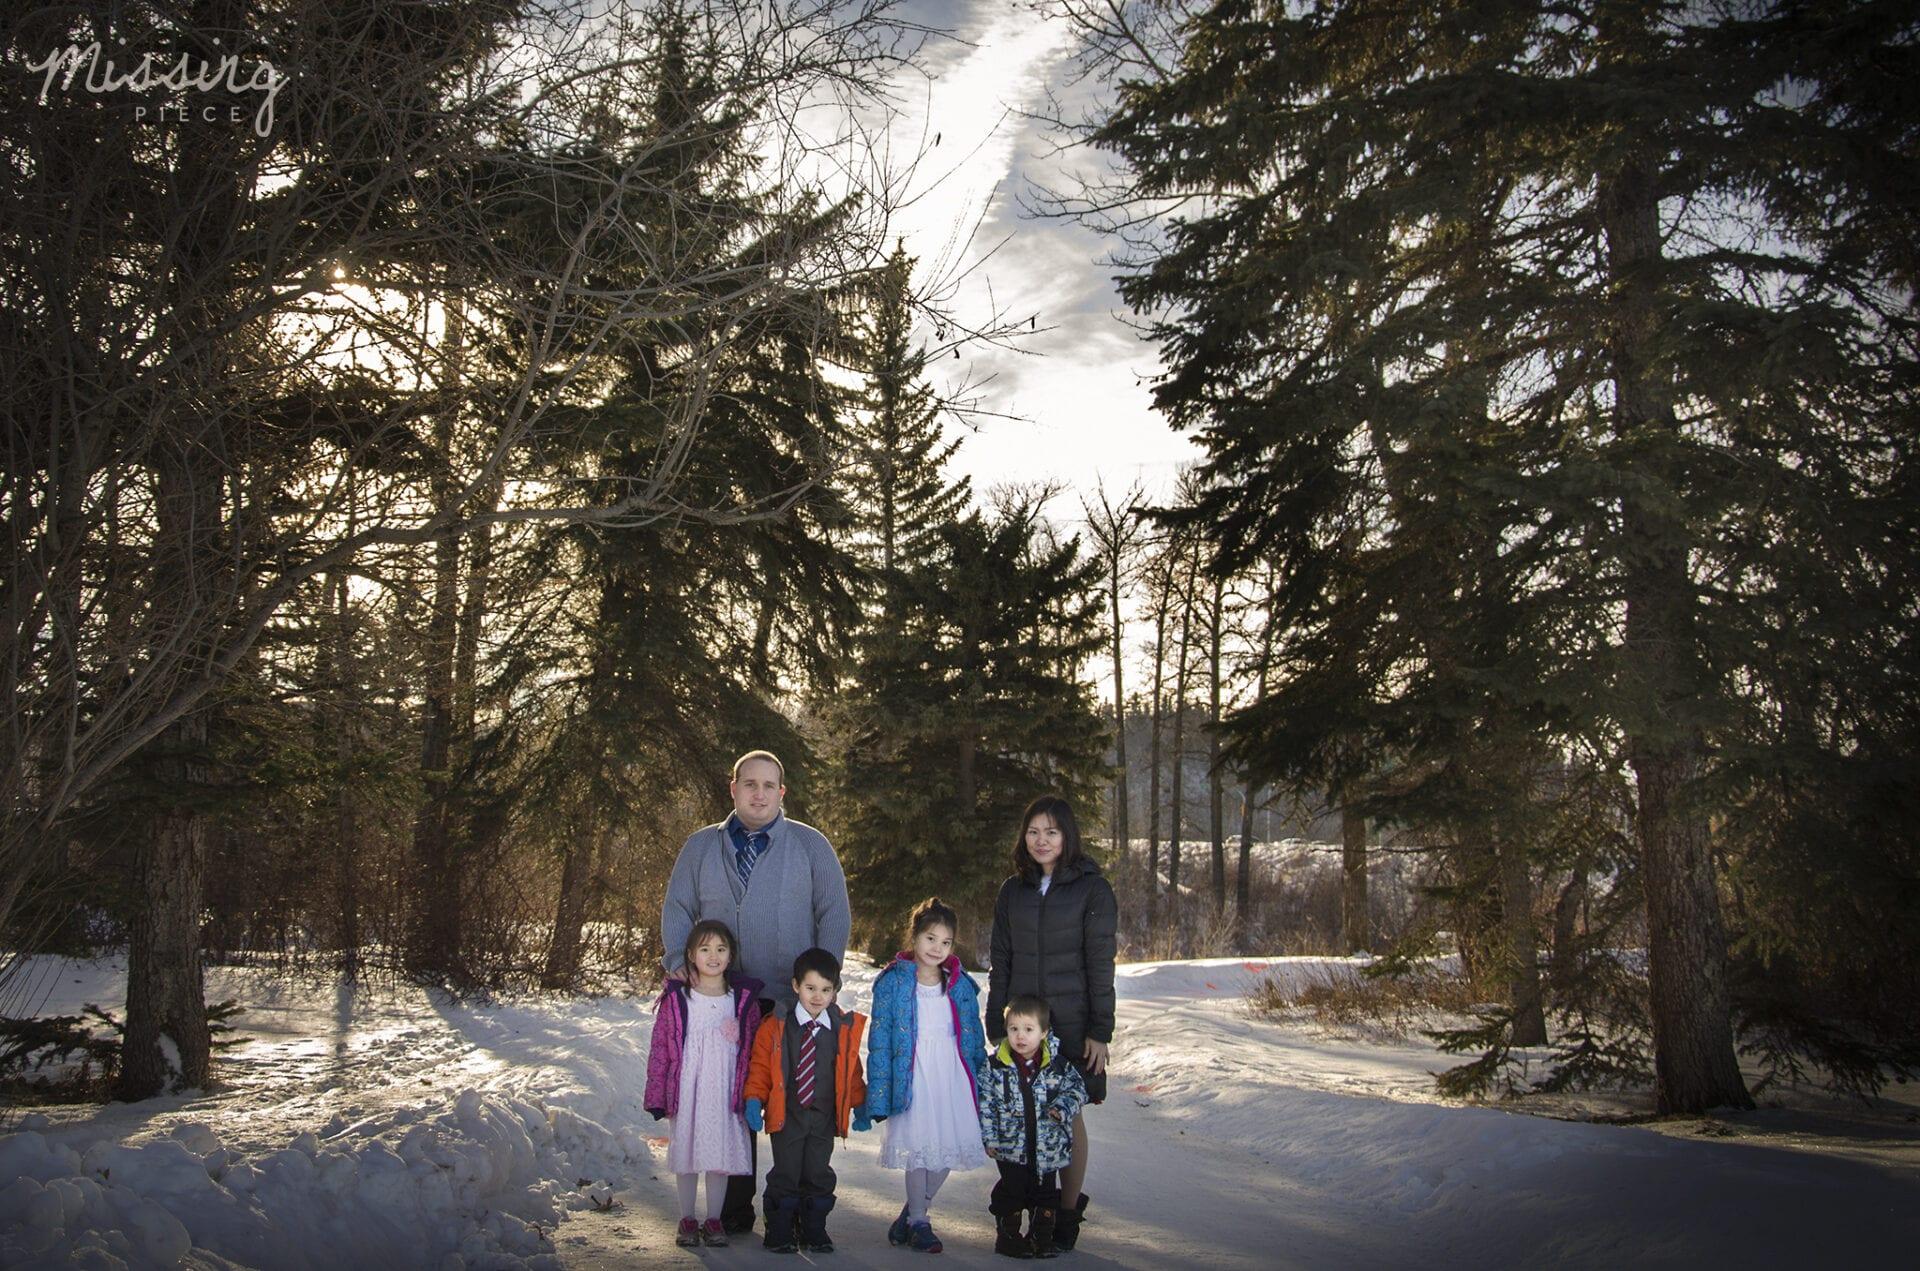 Winter-Family-Portrait-Session-002